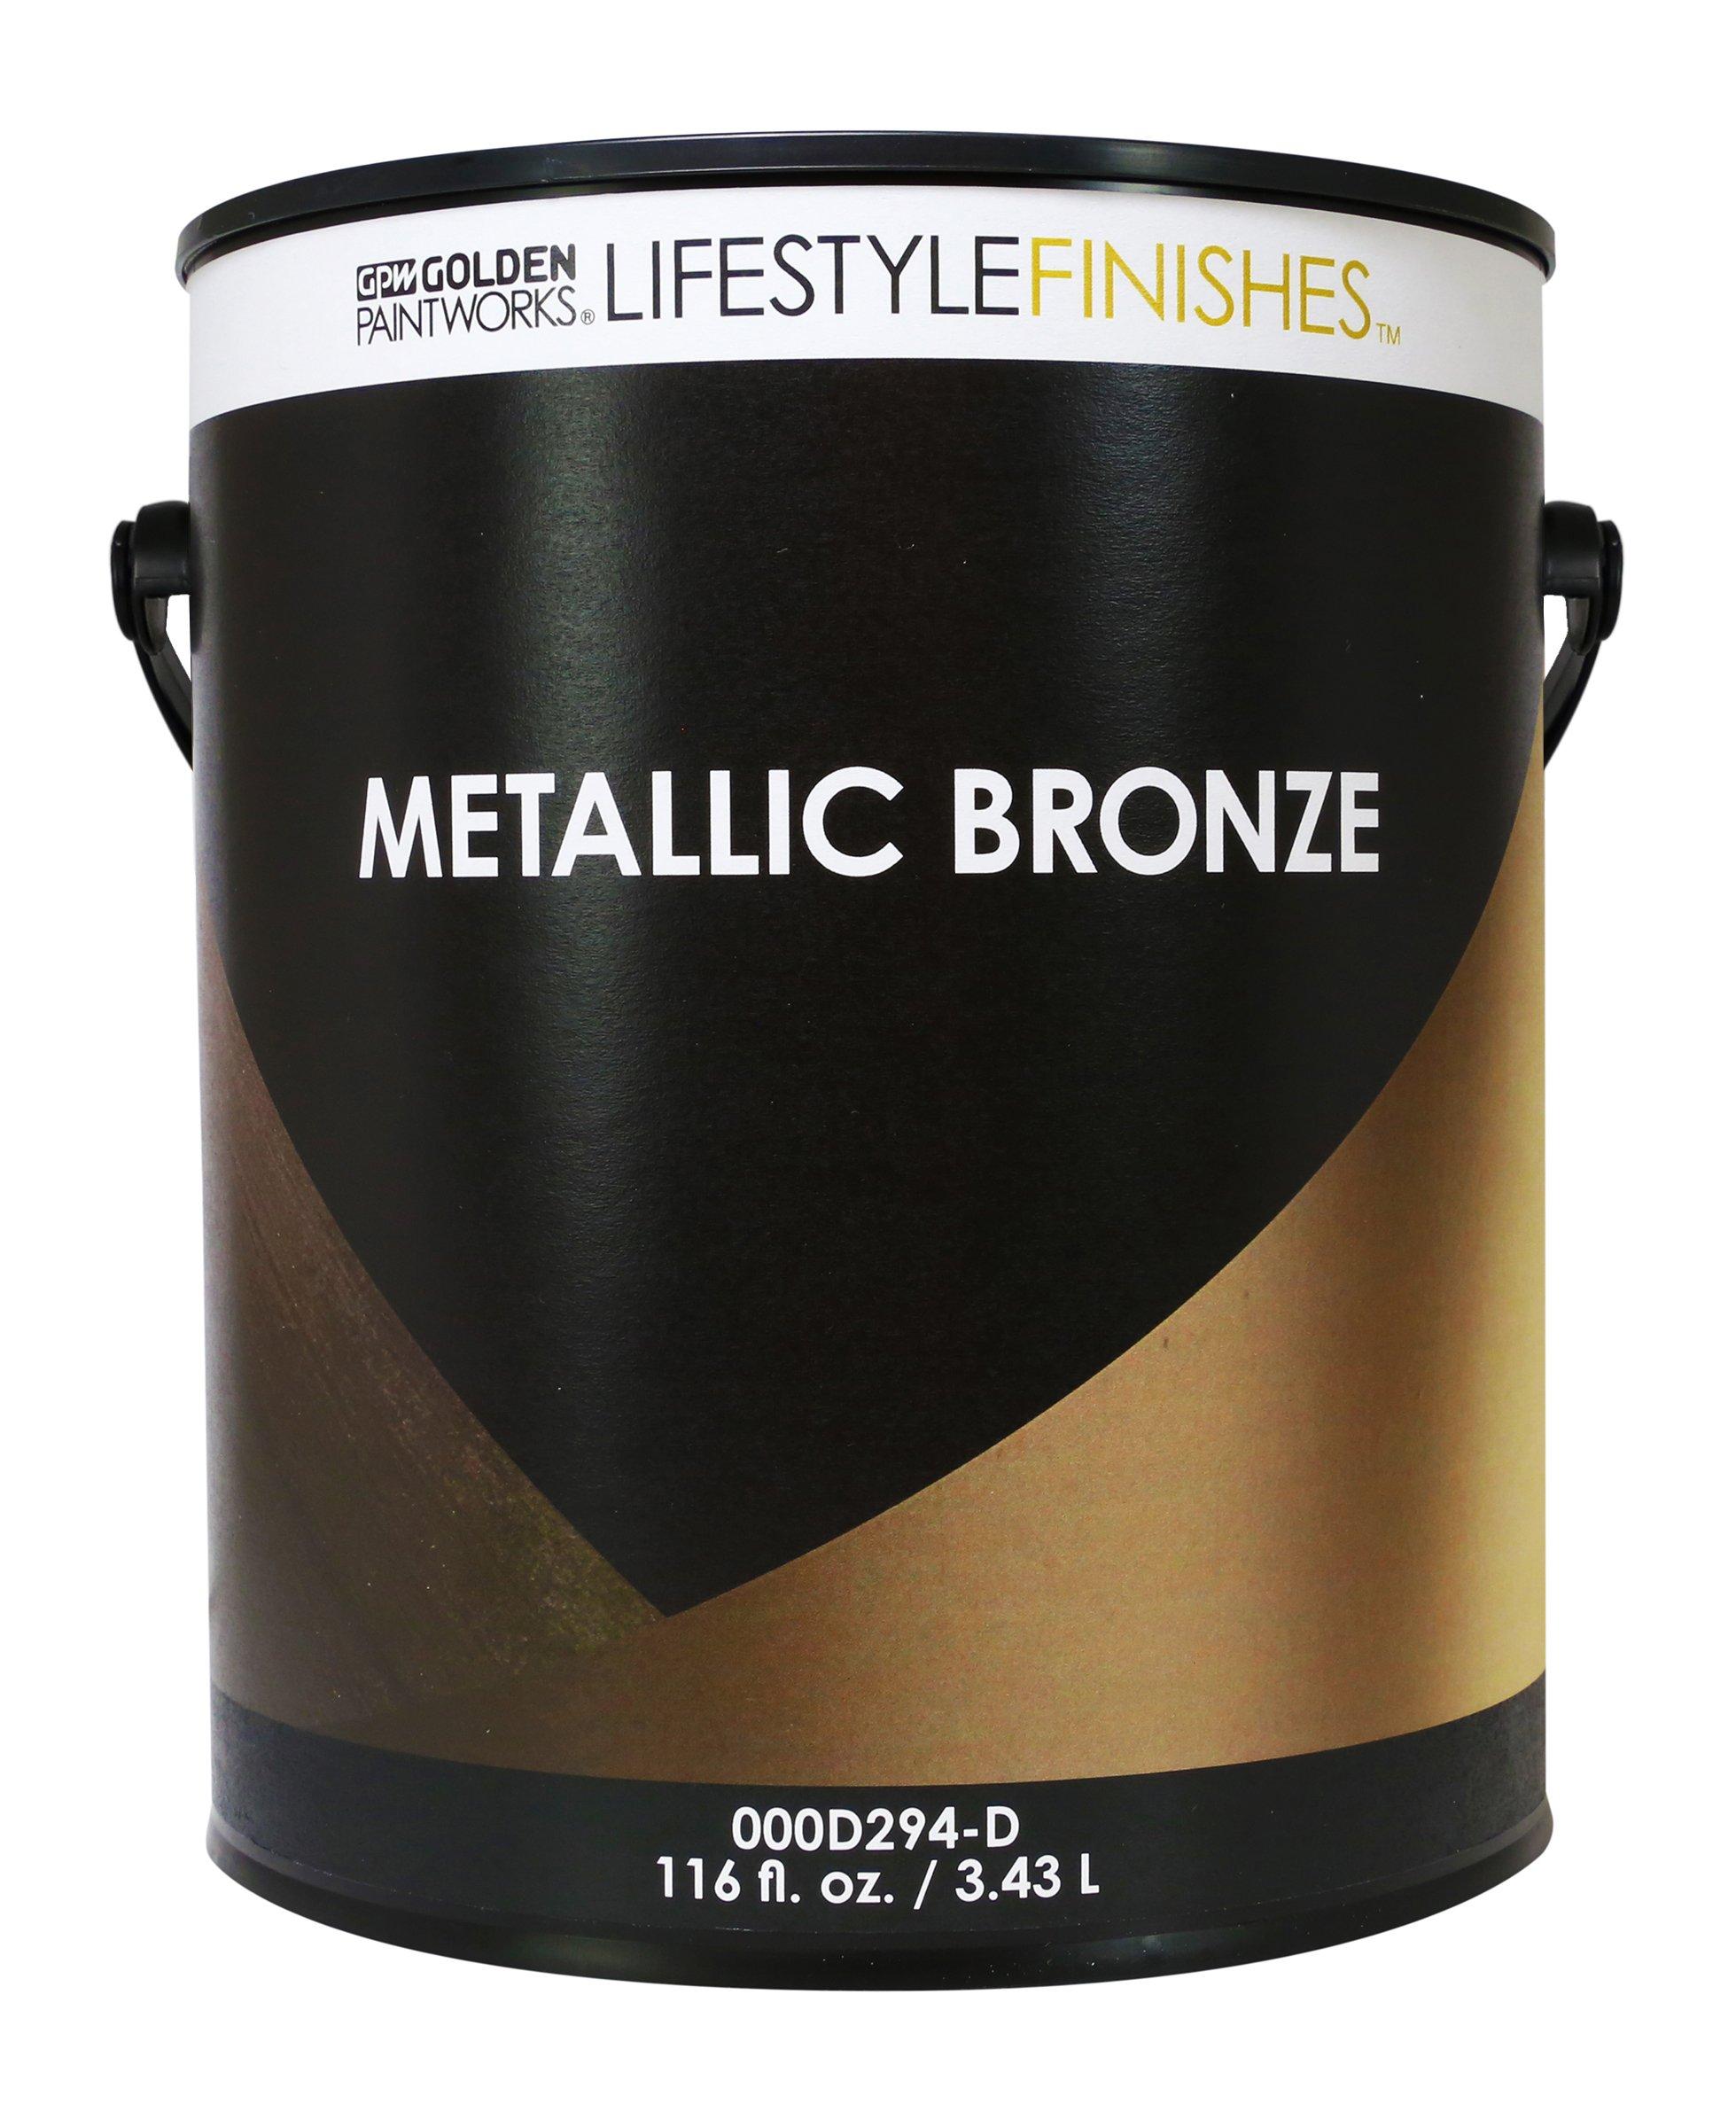 Golden Lifestyle Finishes Metallic Bronze Paint (Quart)